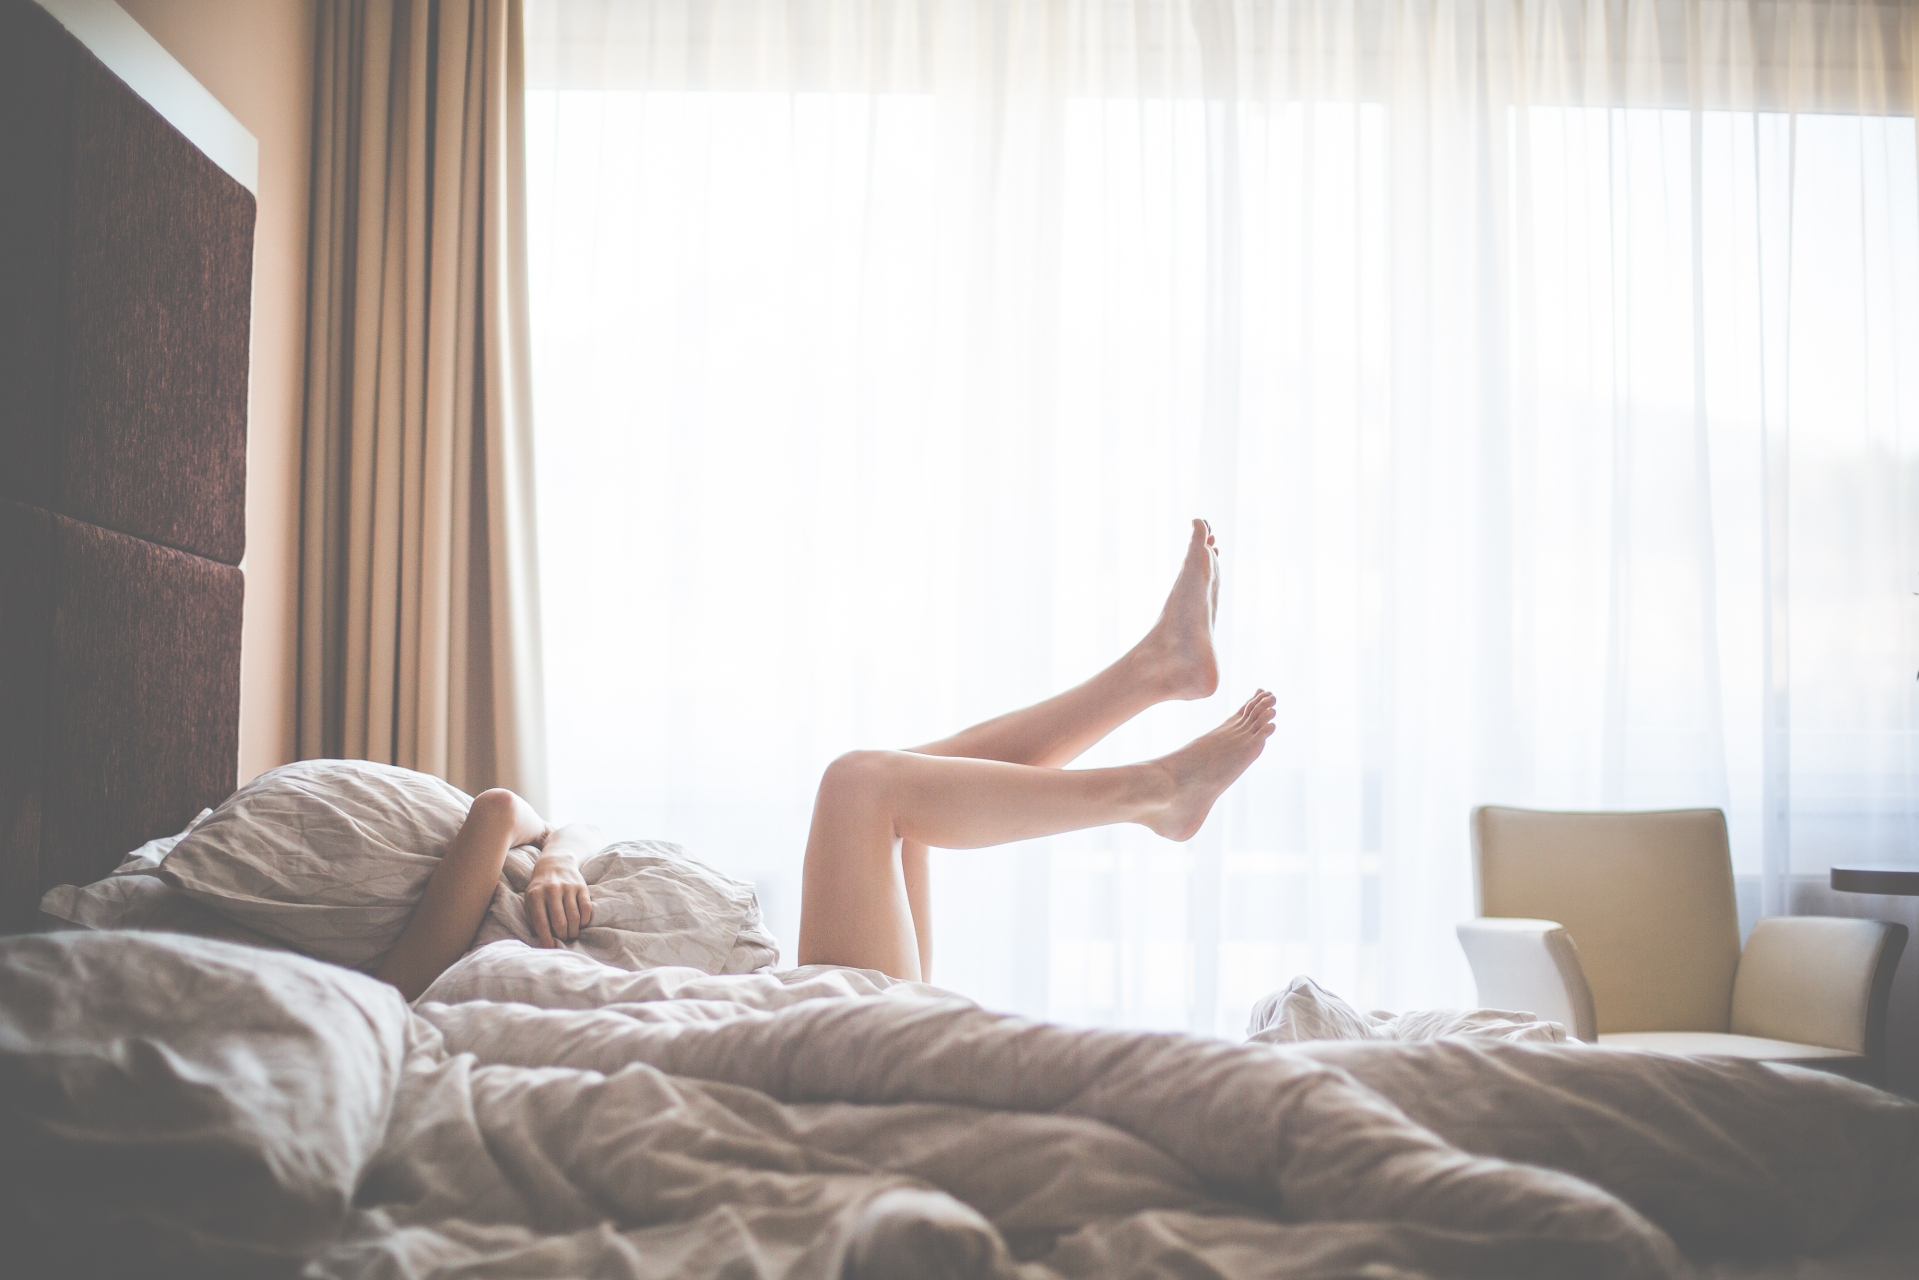 beautiful-woman-enjoying-morning-relax-in-bed-picjumbo-com